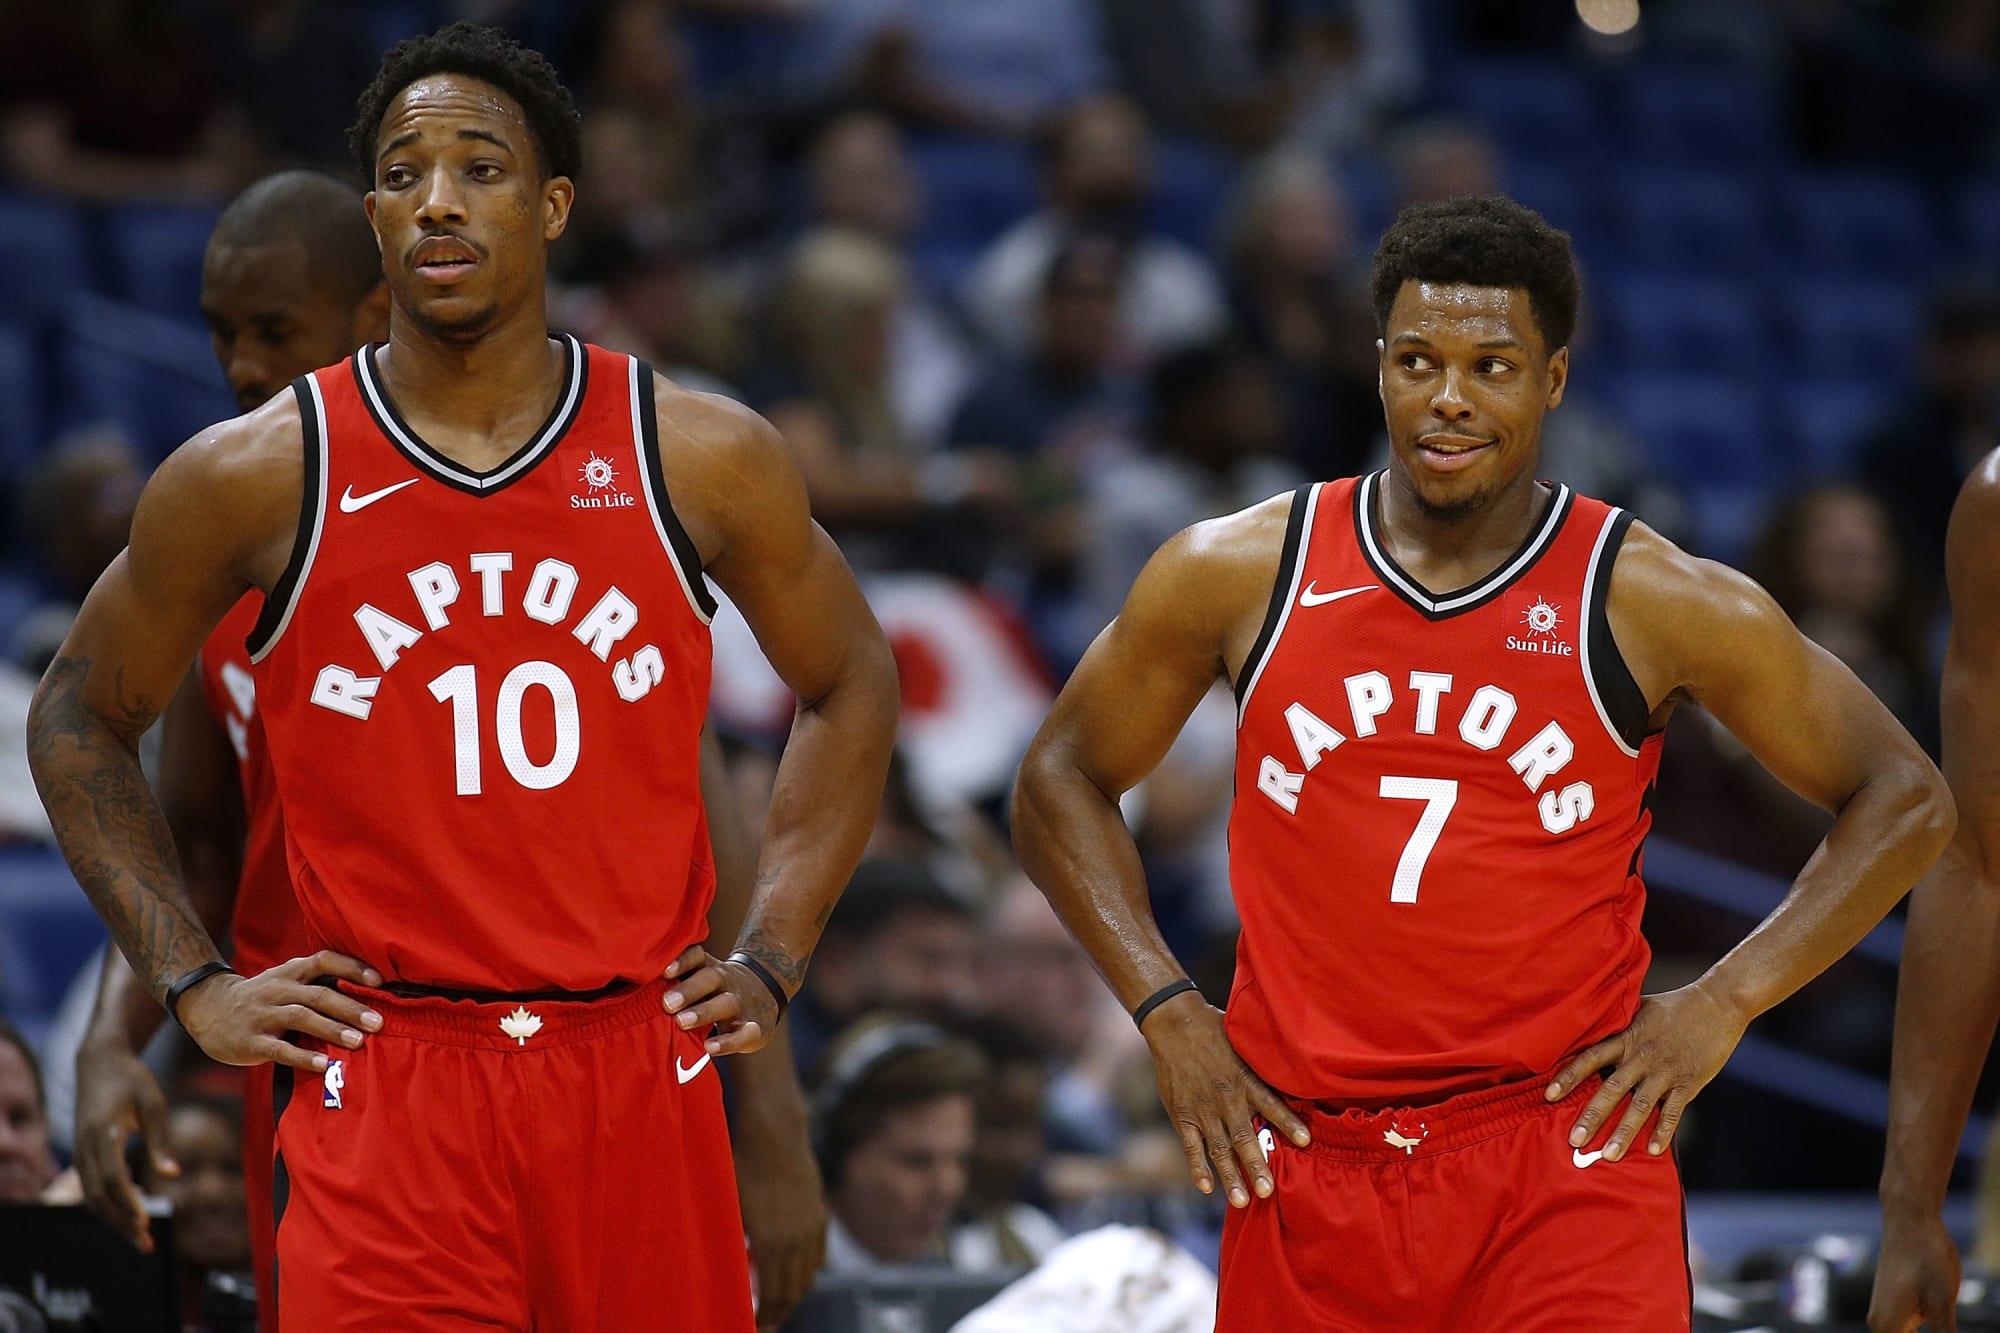 Toronto Raptors: Can Kyle Lowry and DeMar DeRozan reunite?